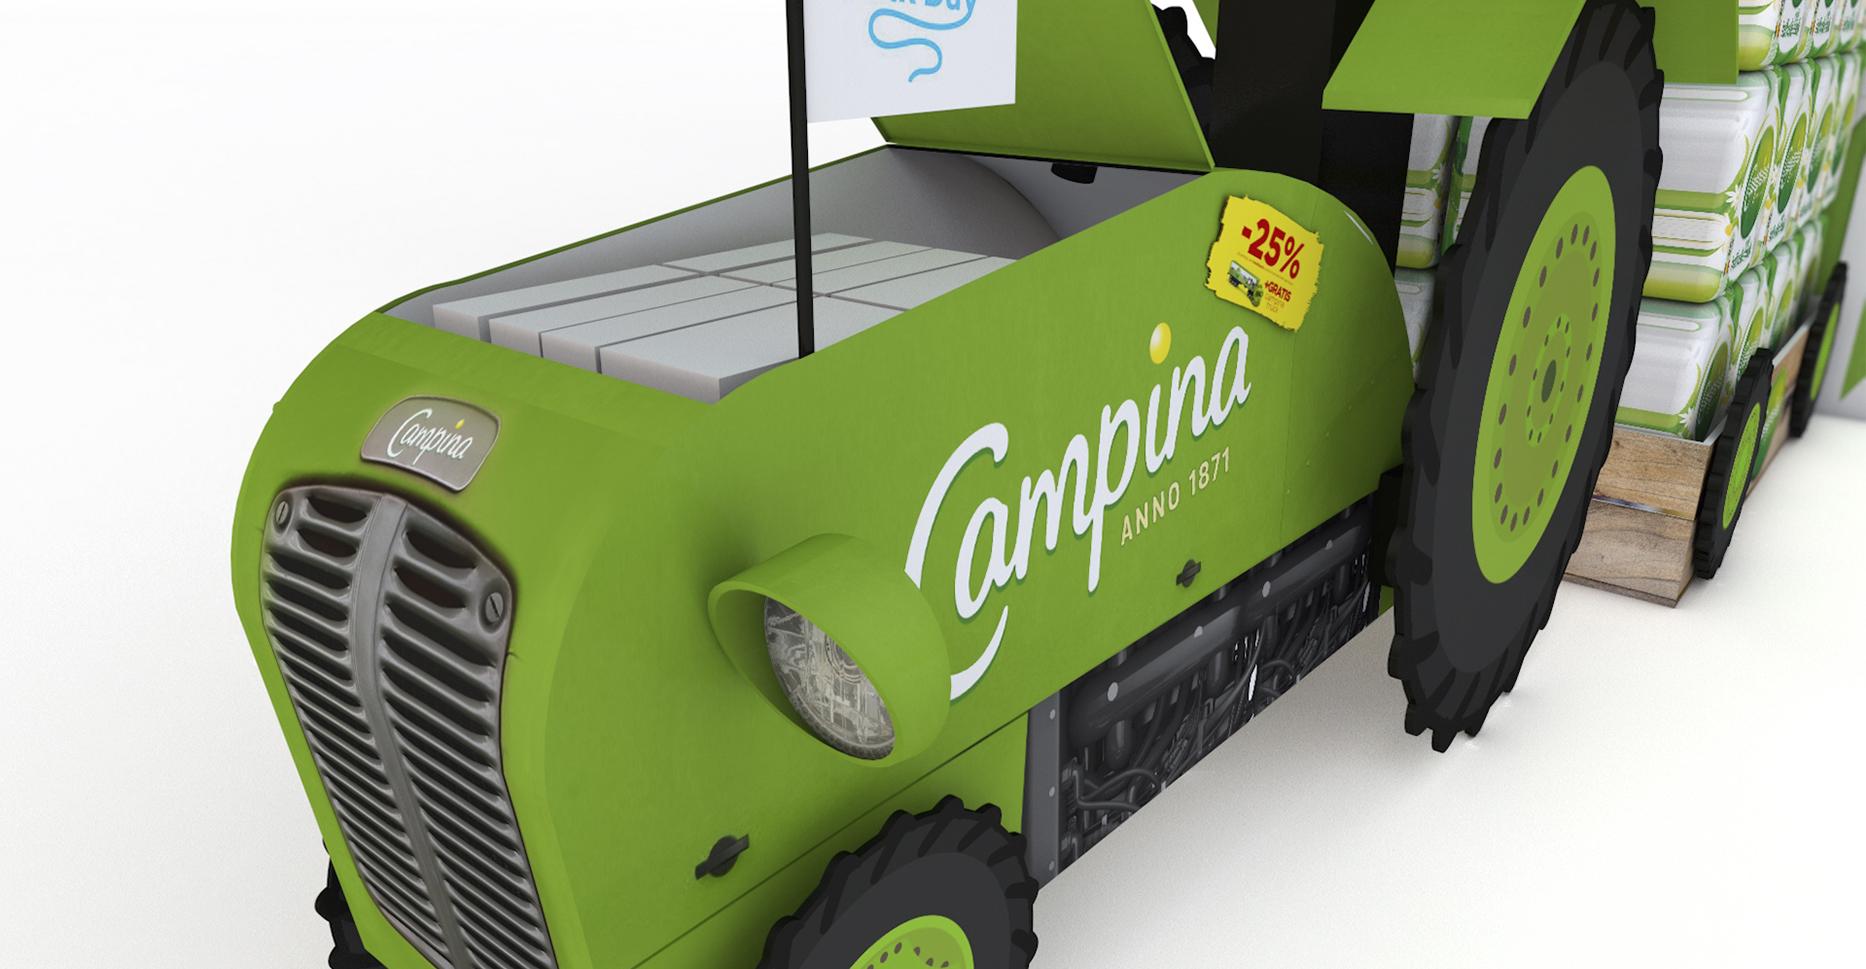 Campina_Tractor_1_0002_CAMPINA_TRACTOR_02_DDL.jpg